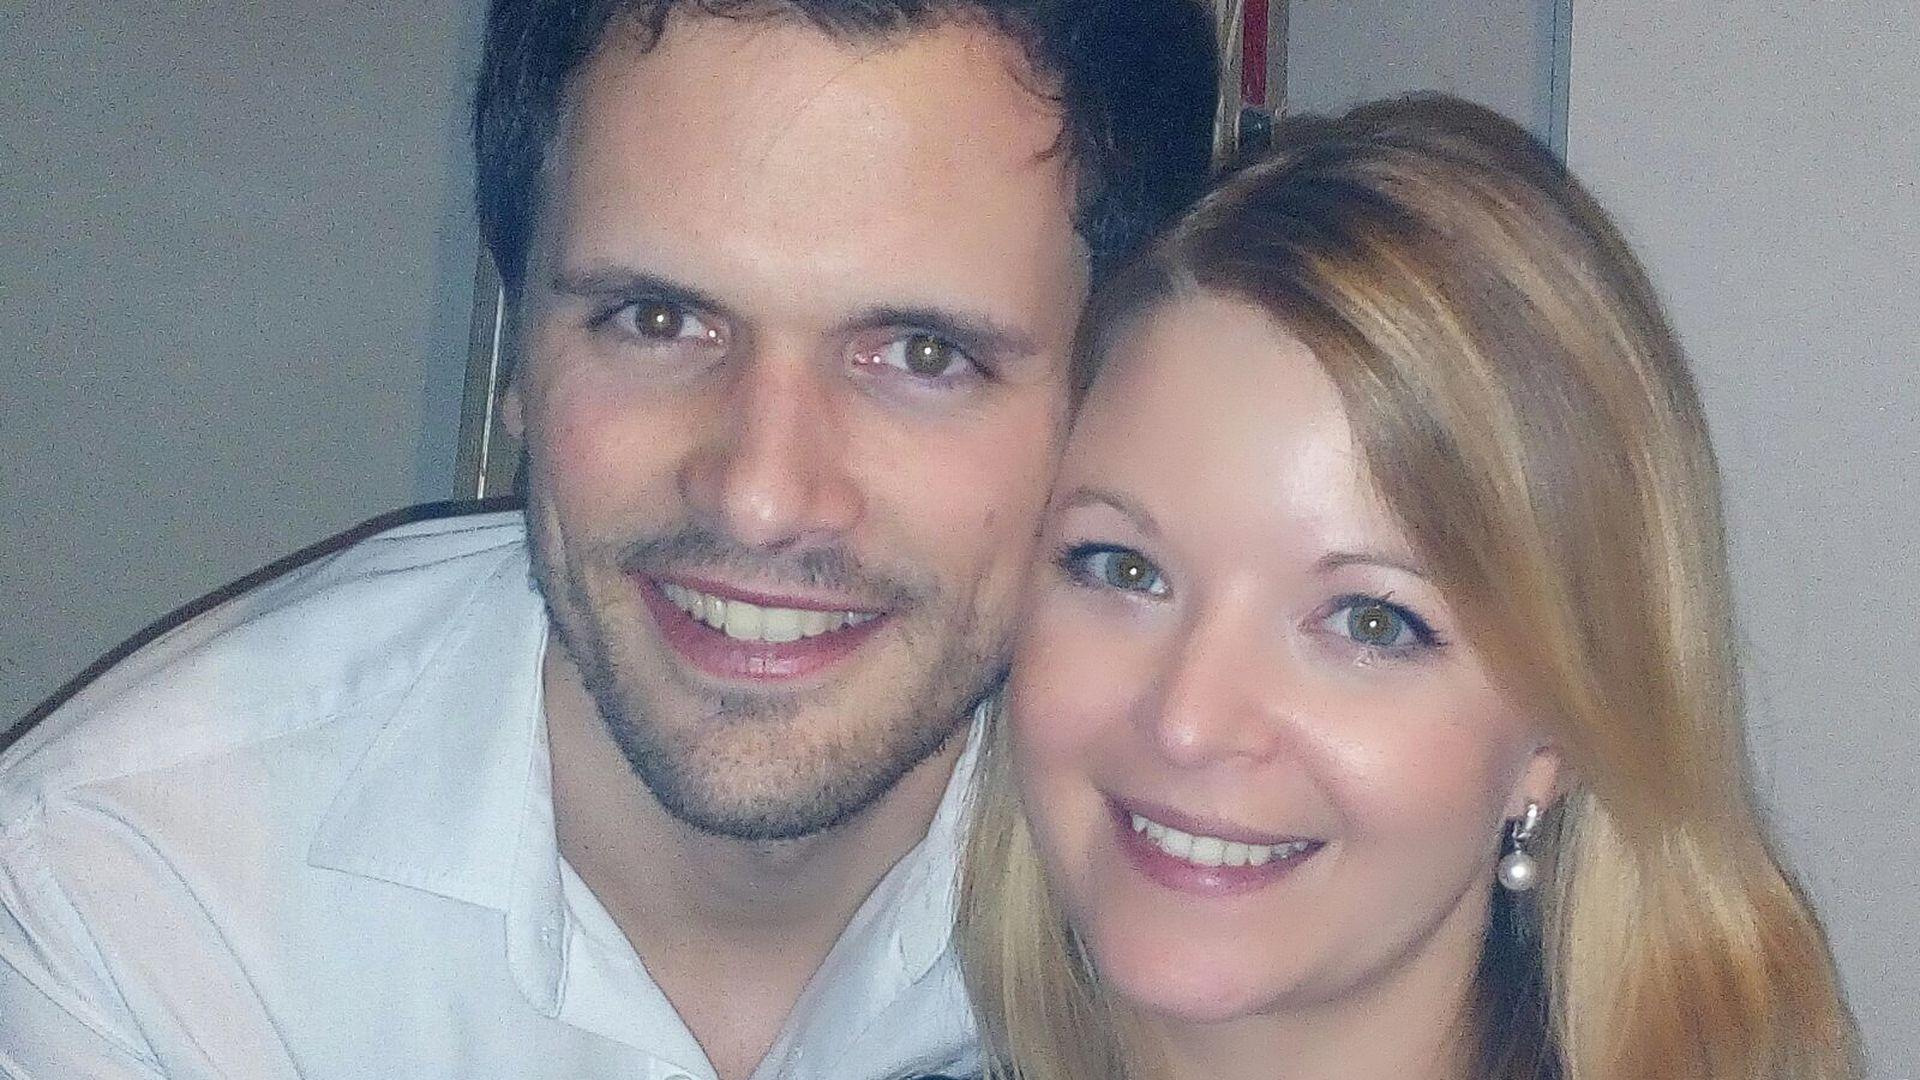 Ramona Stephan Bei Dem Hadeb Paar Ist Viel Passiert